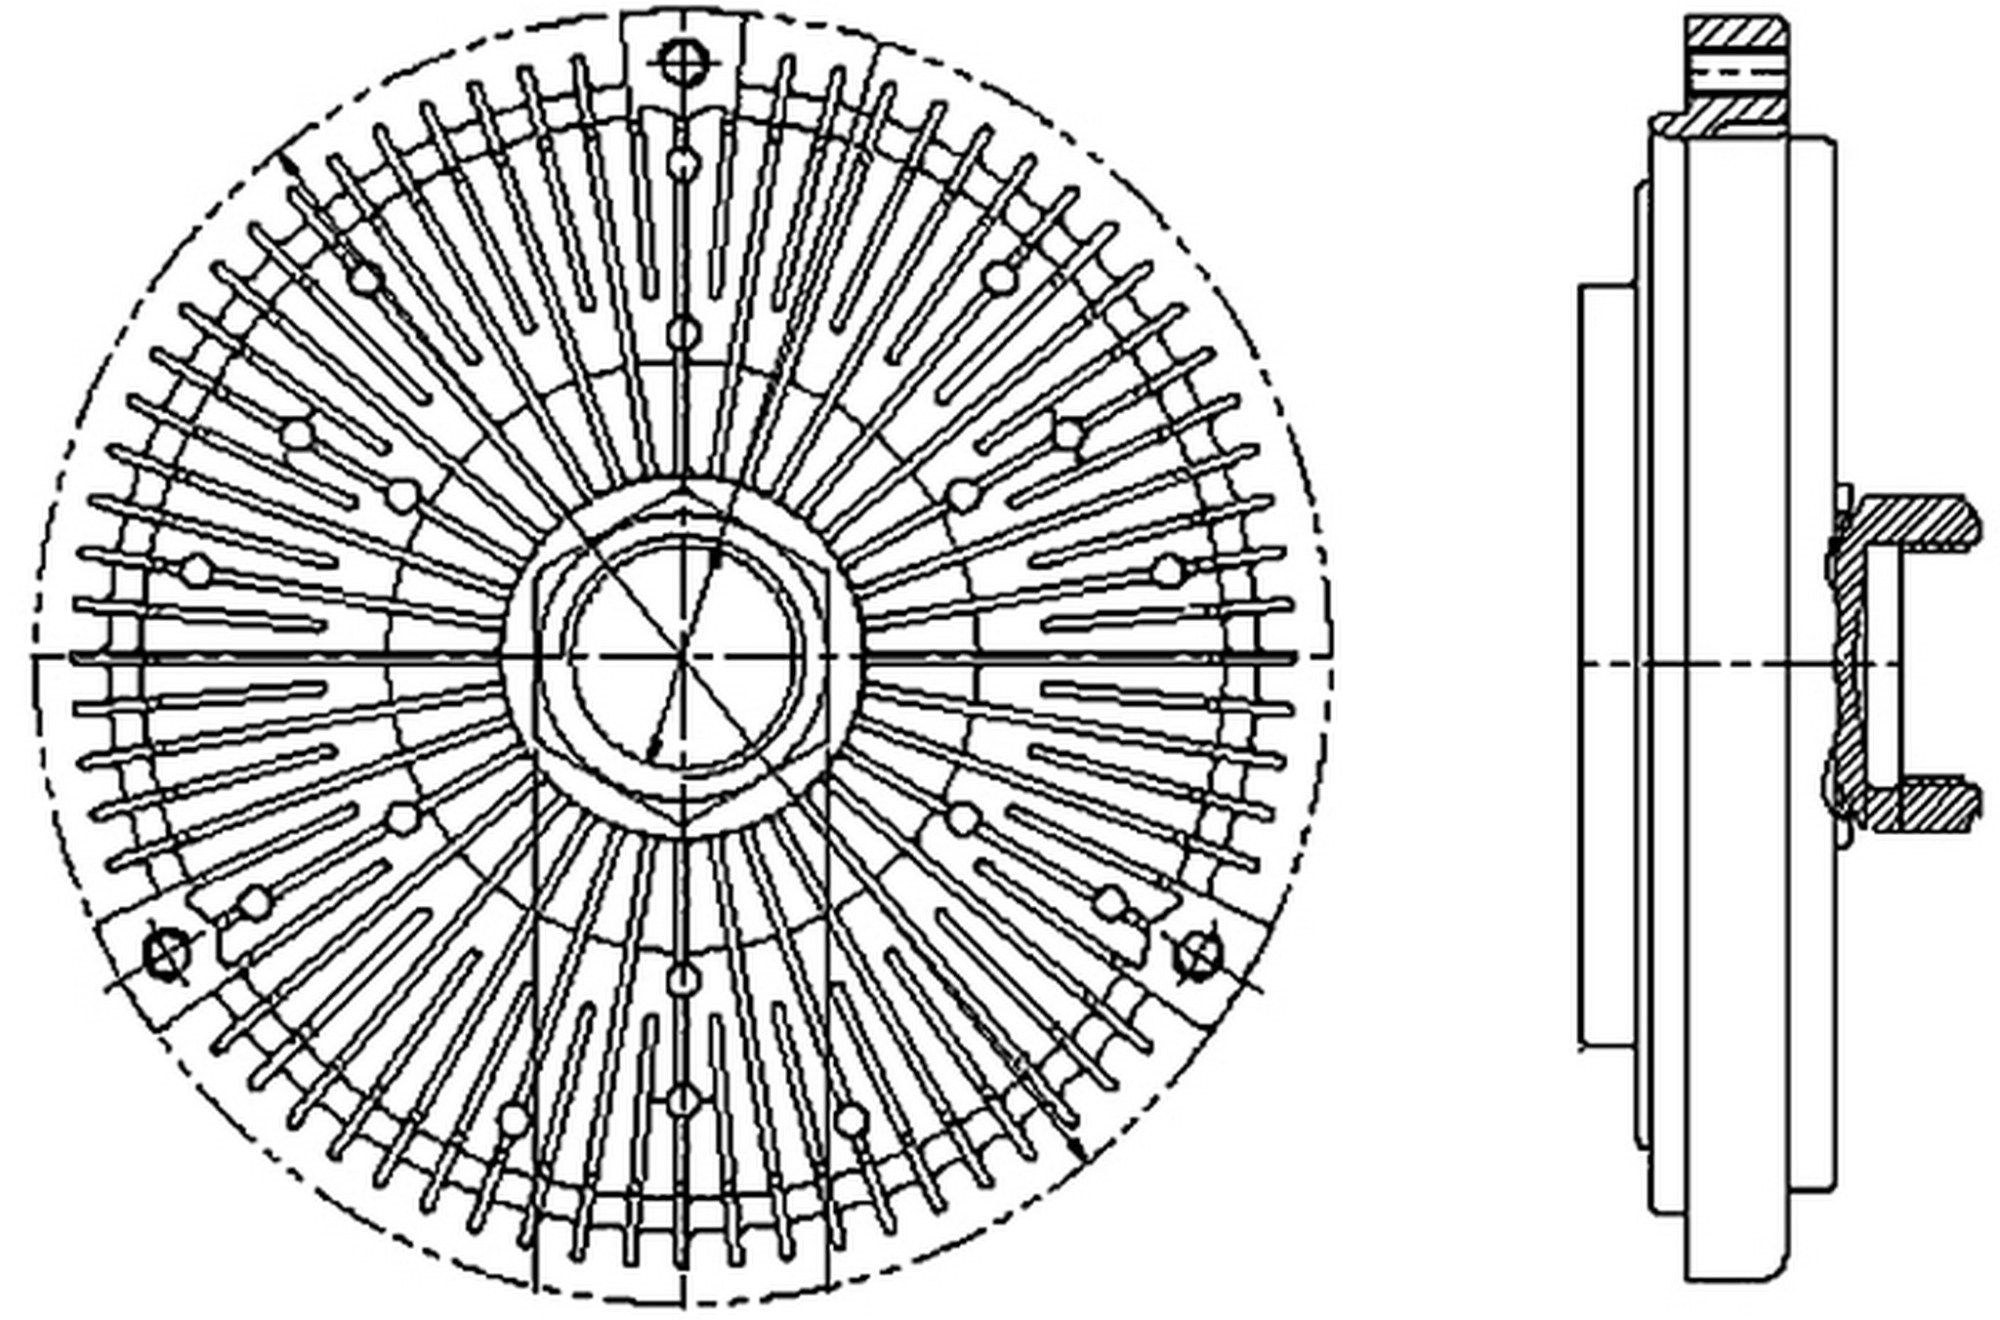 hight resolution of 1999 mercedes benz ml320 engine cooling fan clutch hl 376731491